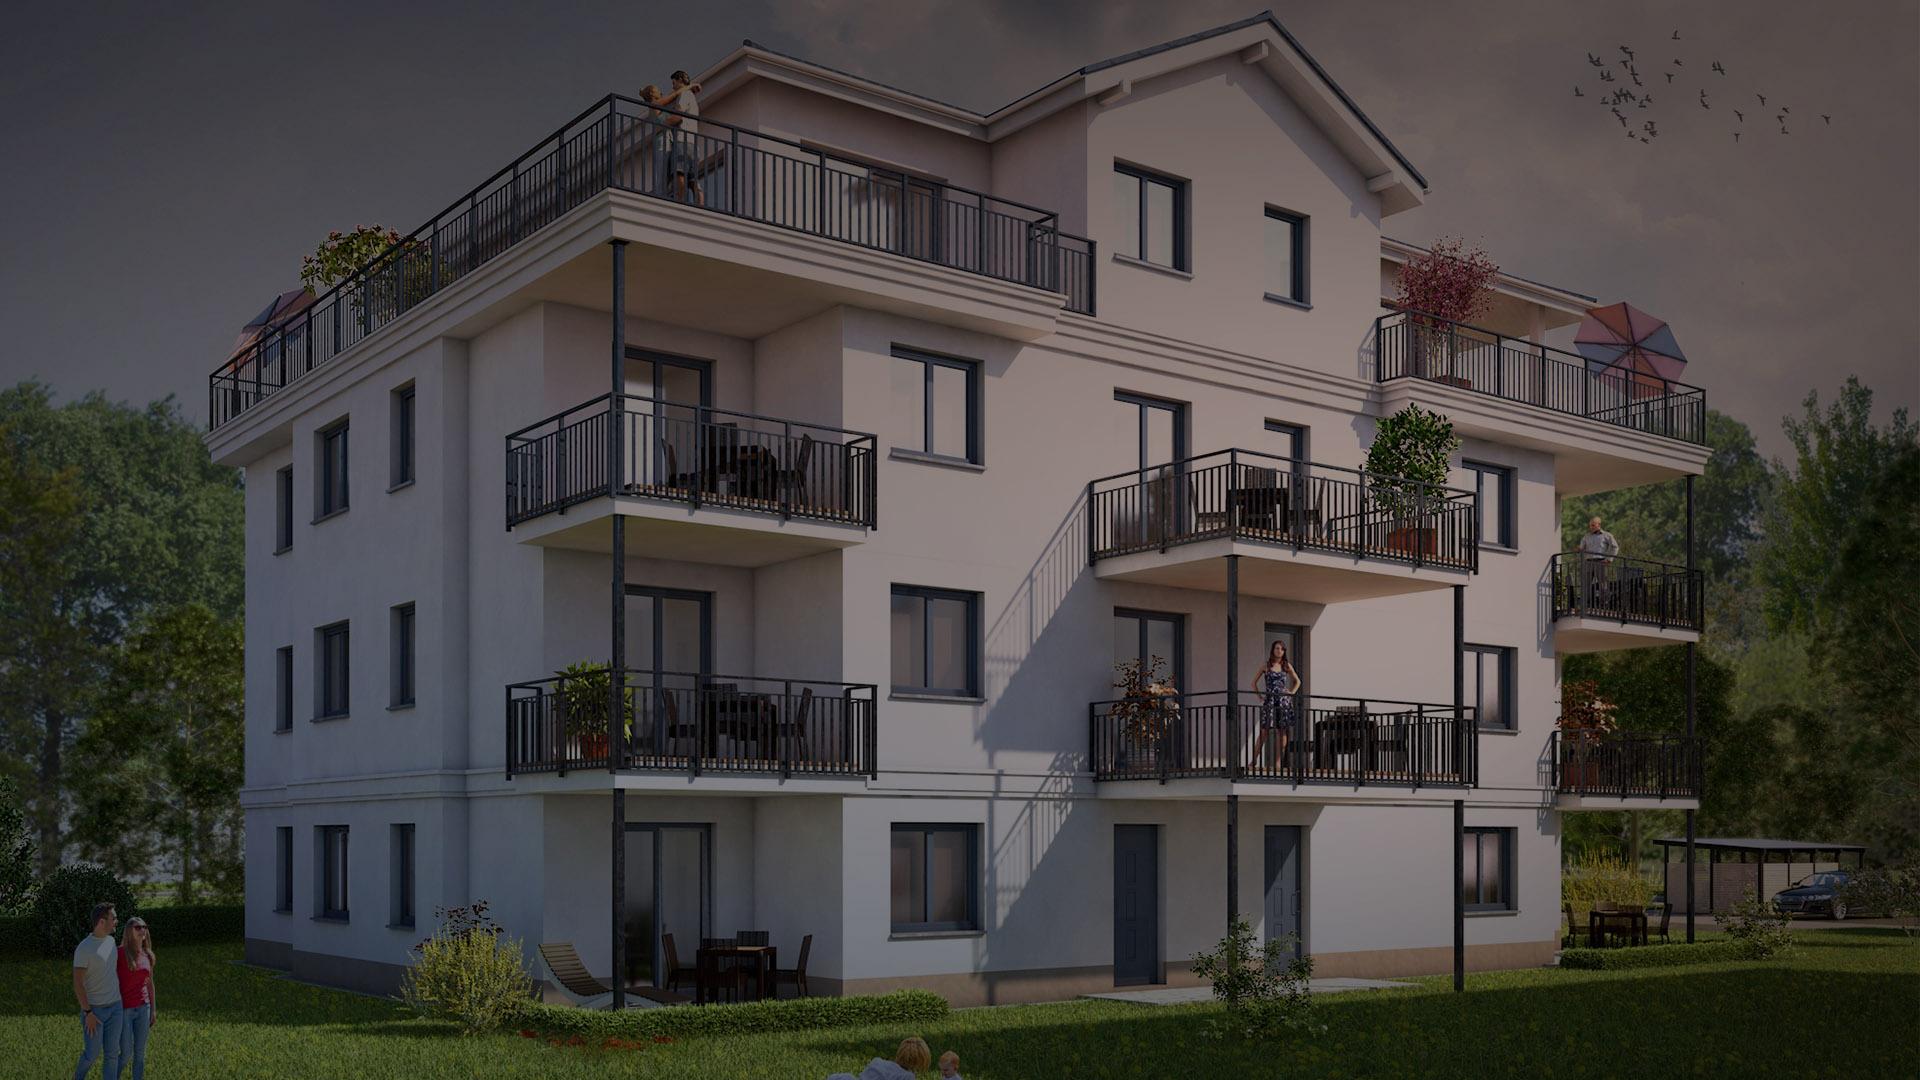 4 Raum Wohnung Haus 1 Ackerstrae in Cottbus DHAUS